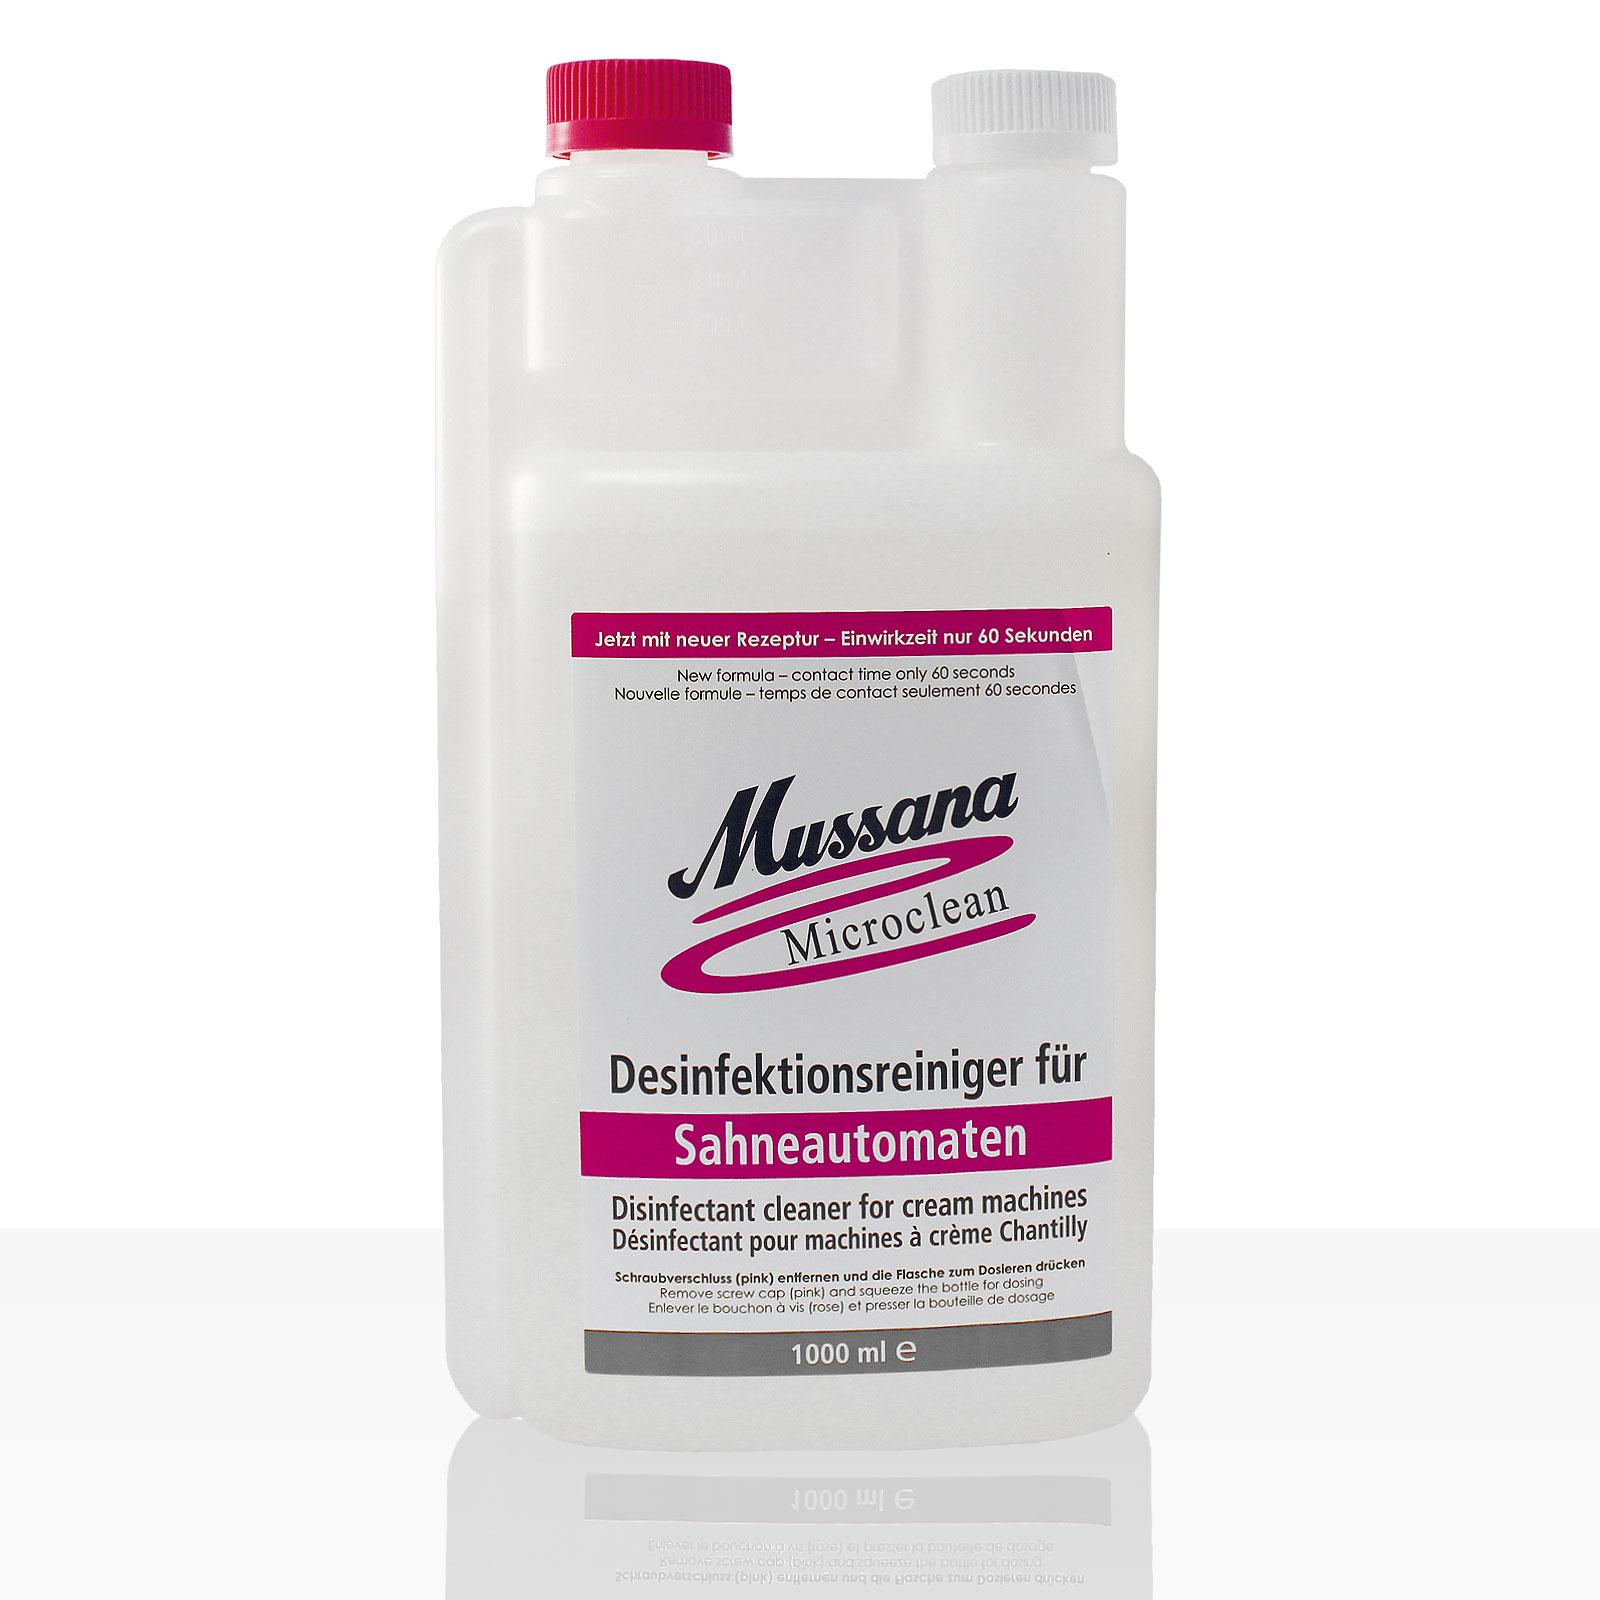 Mussana Microclean Desinfektionsreiniger für Sahneautomaten 12 x 1l